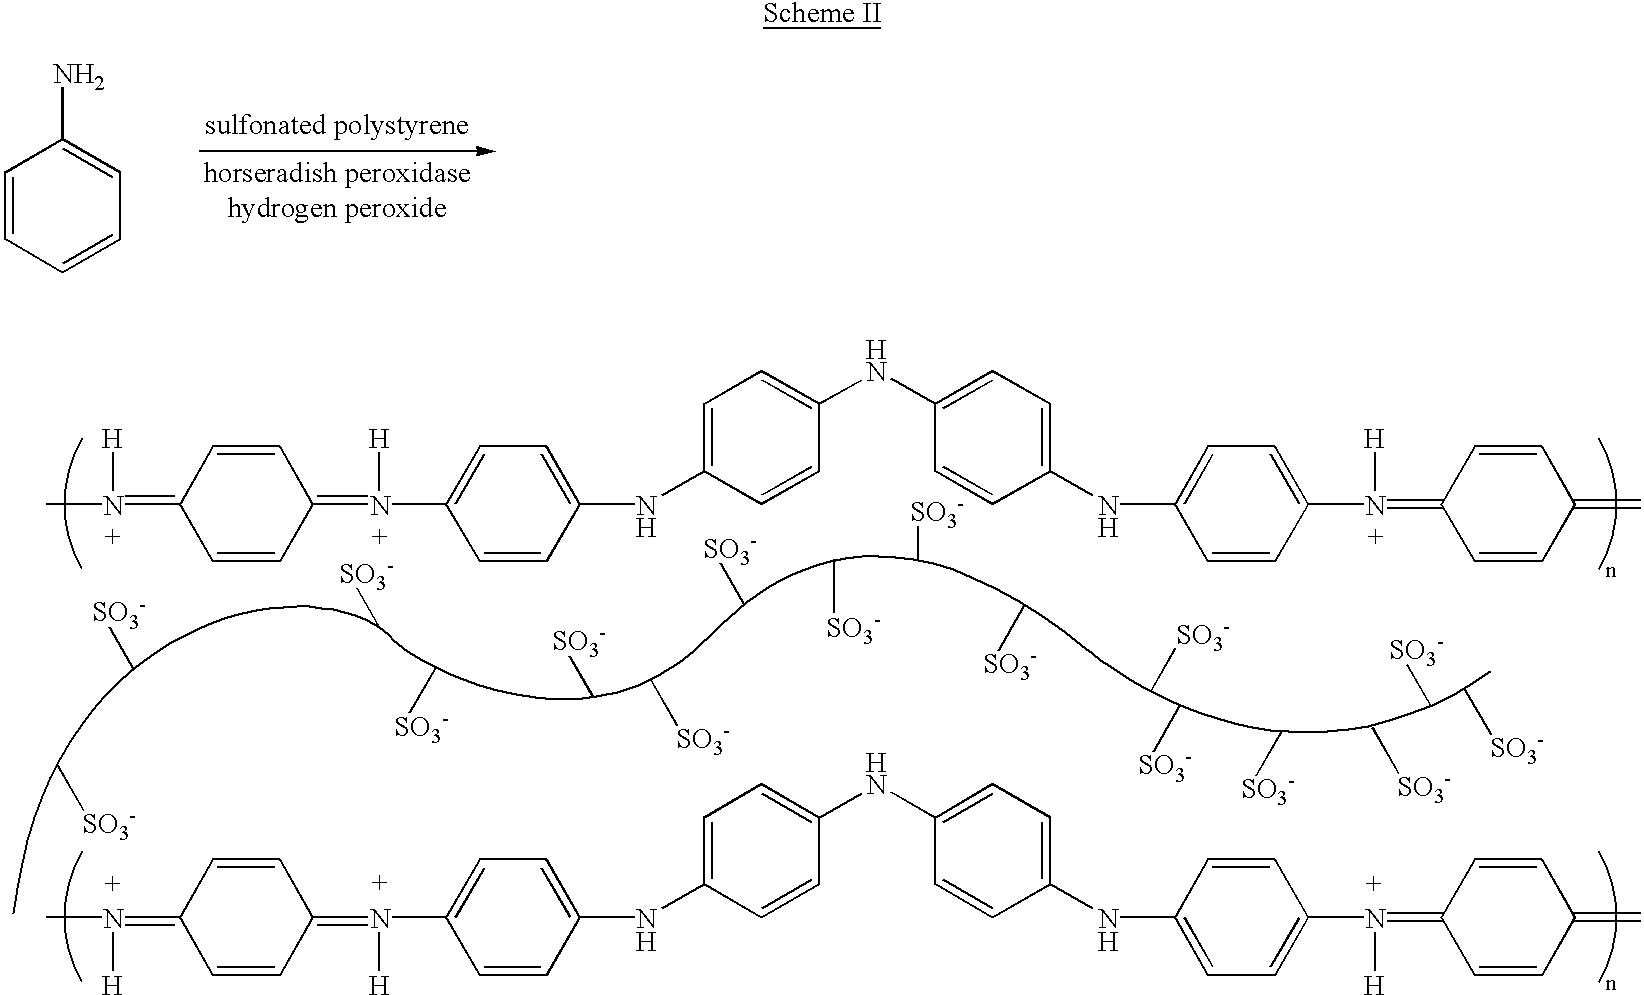 US6569651B1 - Enzymatic polymerization of anilines or phenols around ...